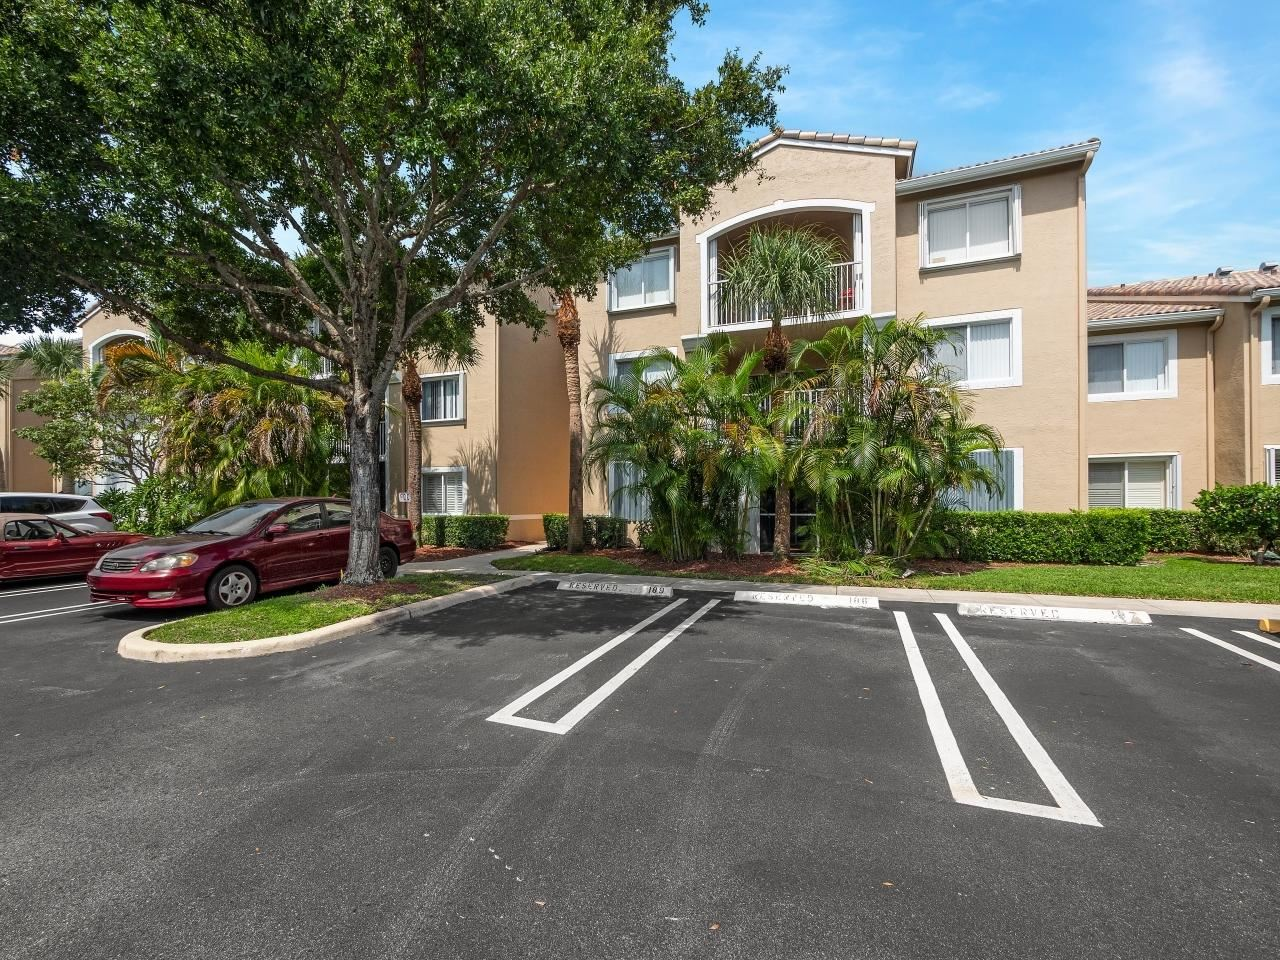 242 Village Boulevard #2110, Tequesta, FL 33469 - MLS#: RX-10732712